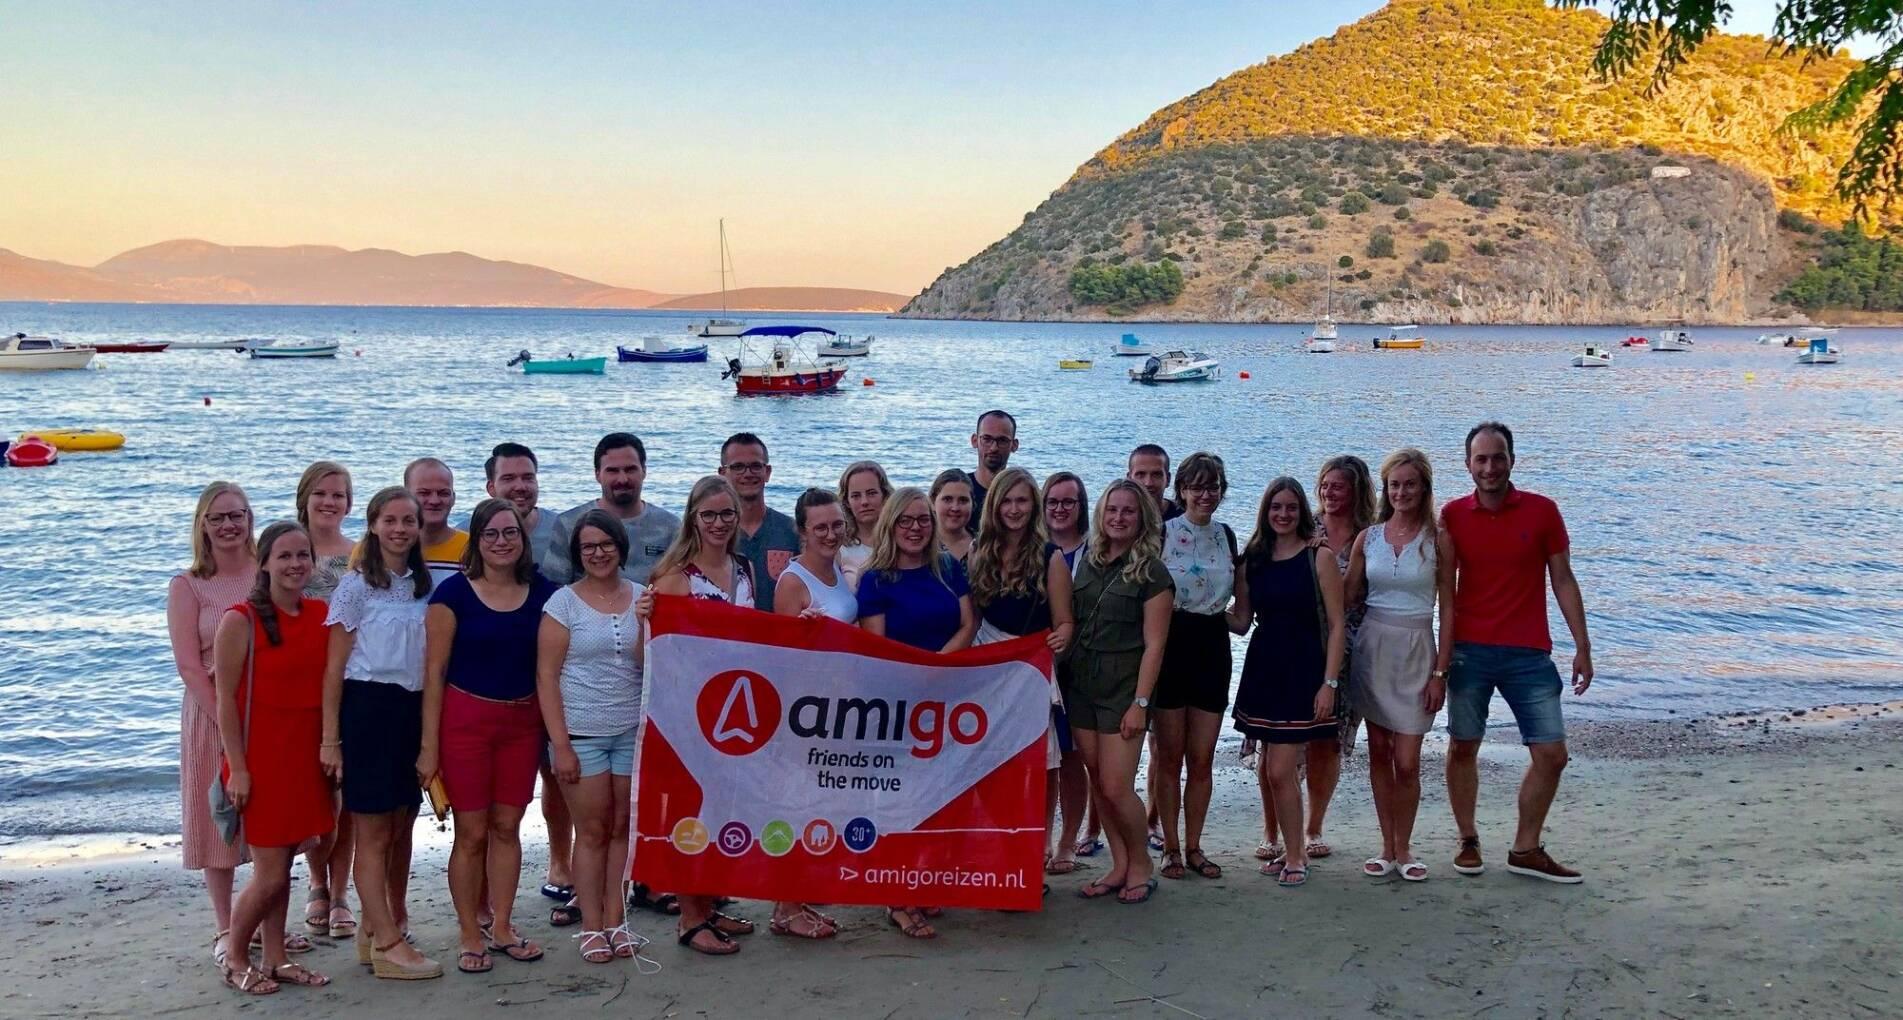 Griekenland, Peloponnesos: Athene, Korinthe en Griekse stranden - Griekenland - 1